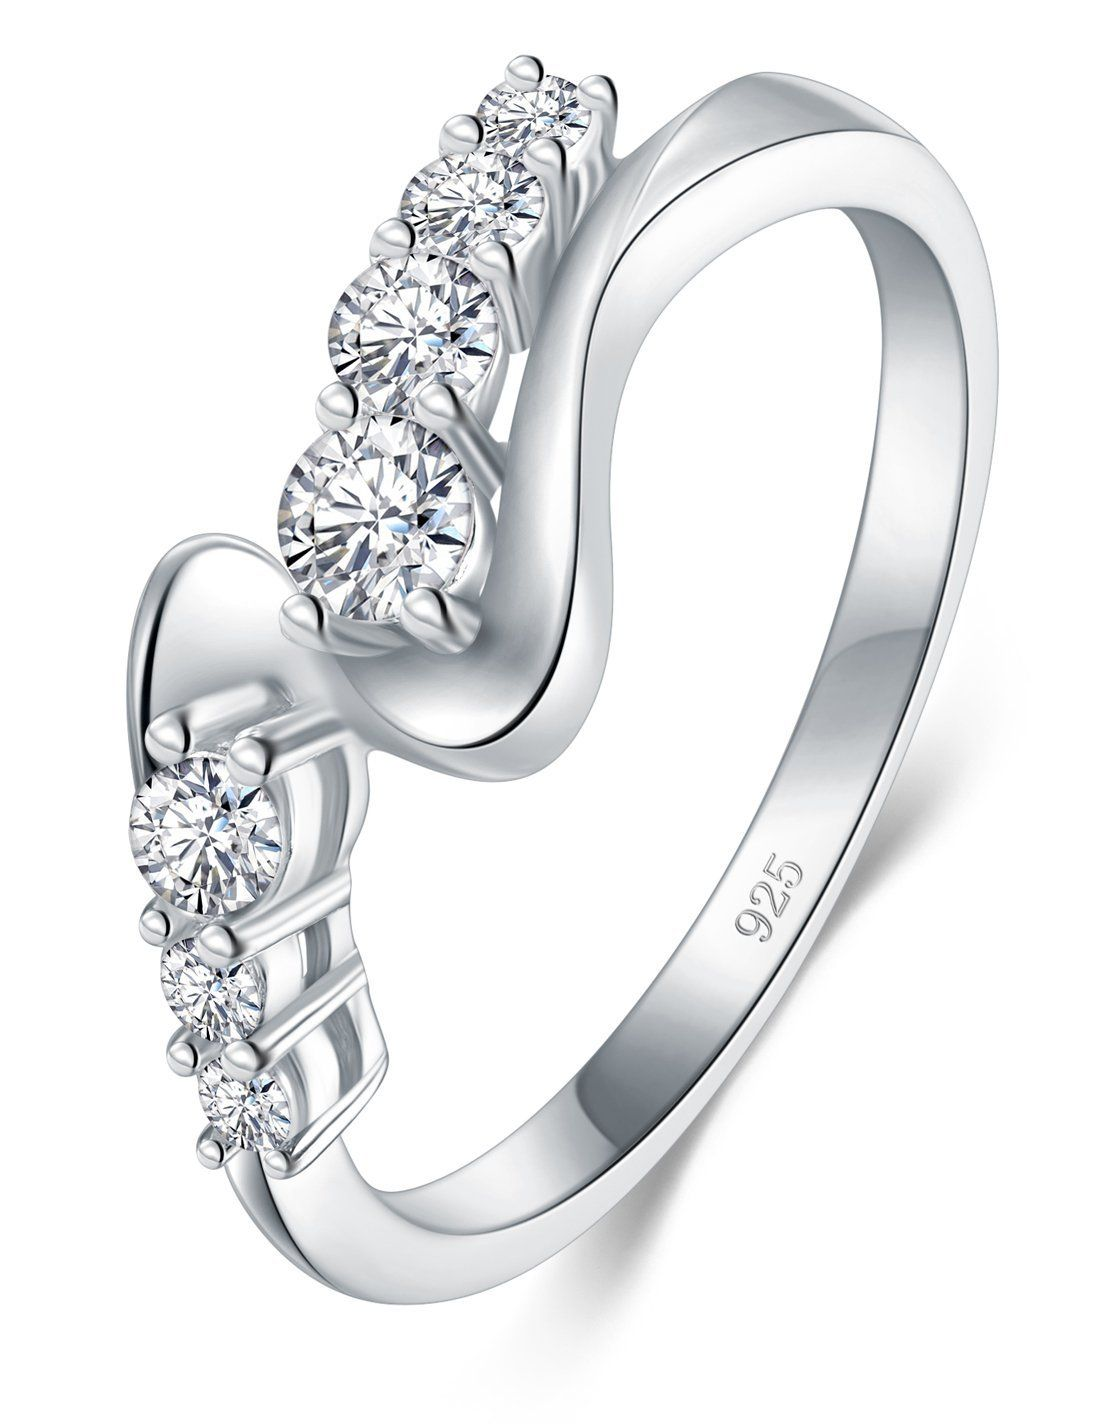 BORUO 925 Sterling Silver Ring, Cubic Zirconia CZ Diamond